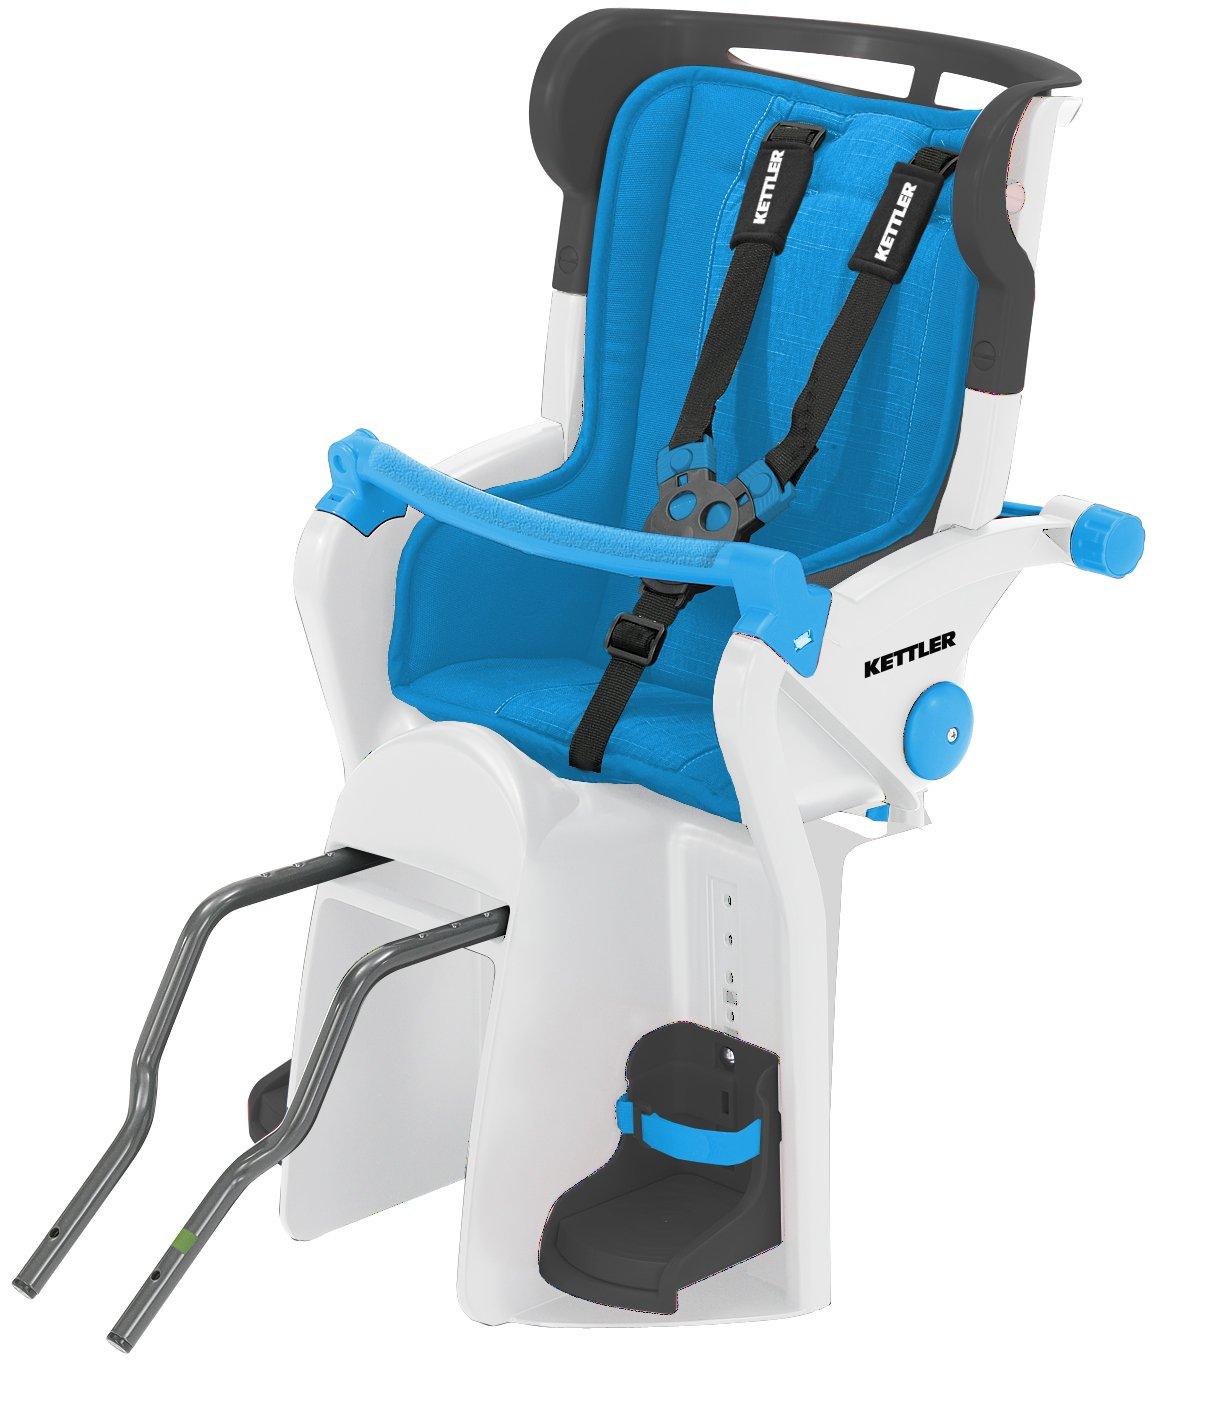 Kettler Flipper Child Bike Seat, Blue by Kettler